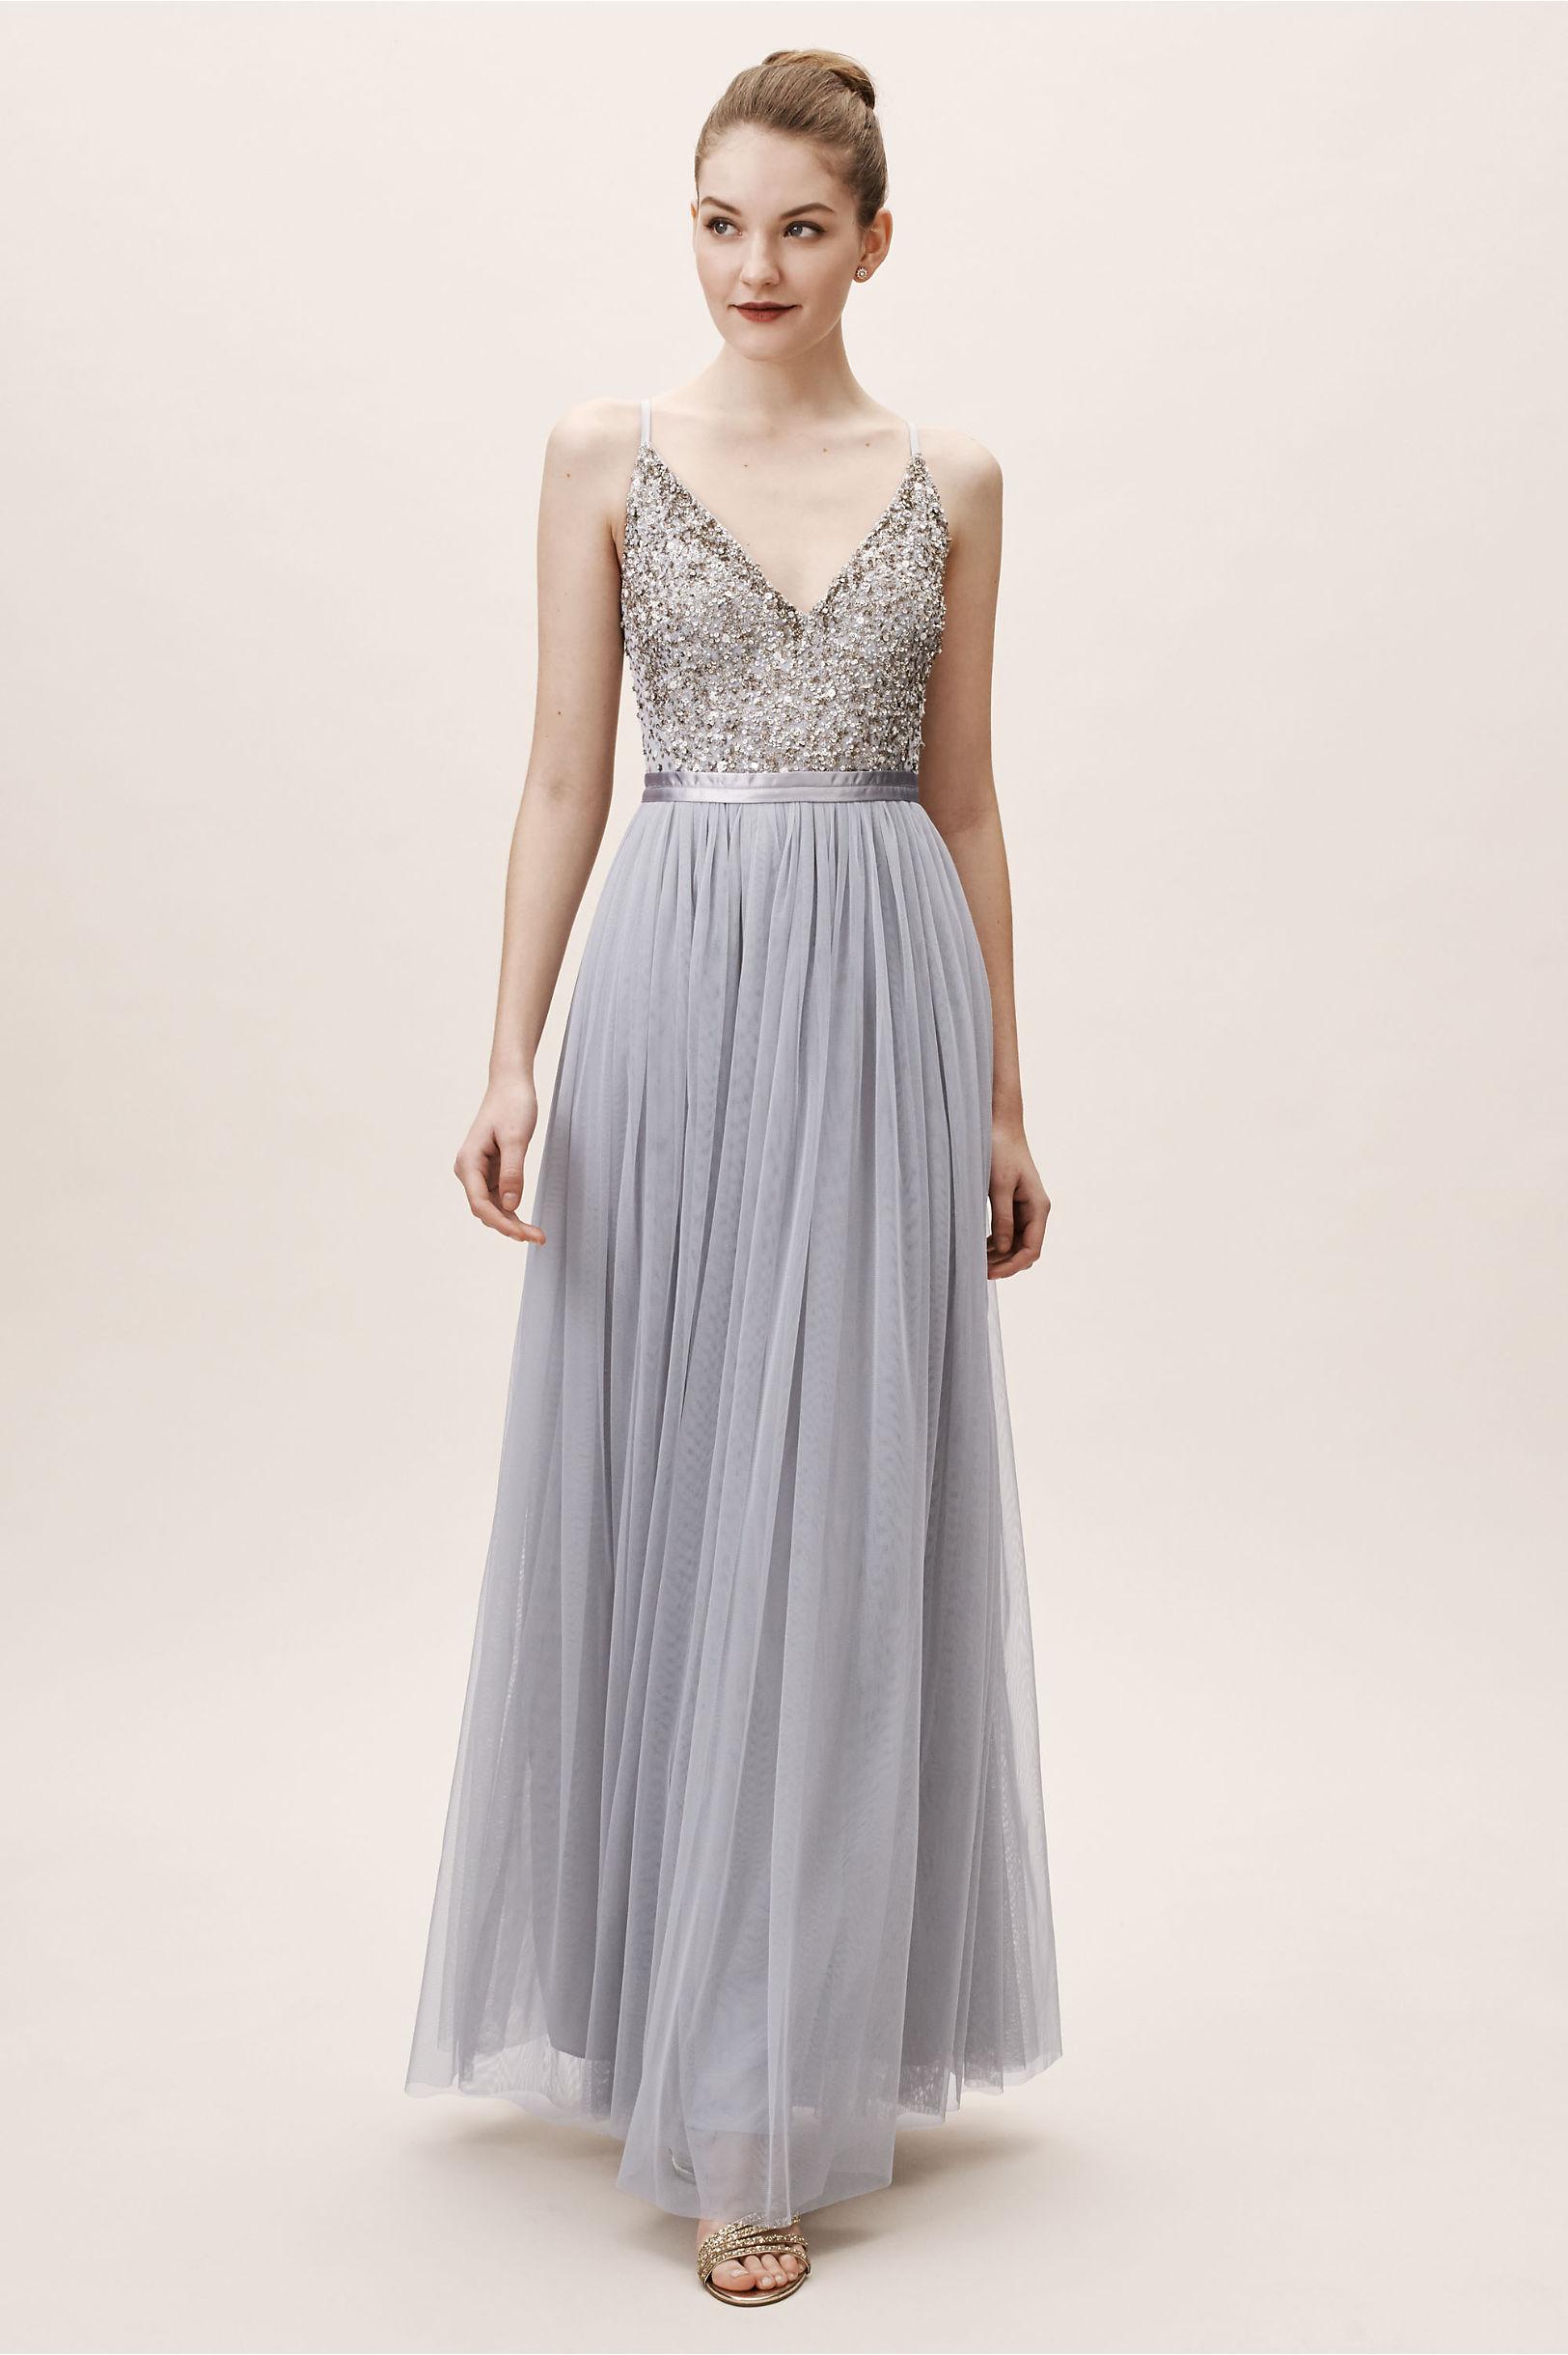 dbb7c96845821 Avery Dress Morning Mist in Bridesmaids & Bridal Party | BHLDN